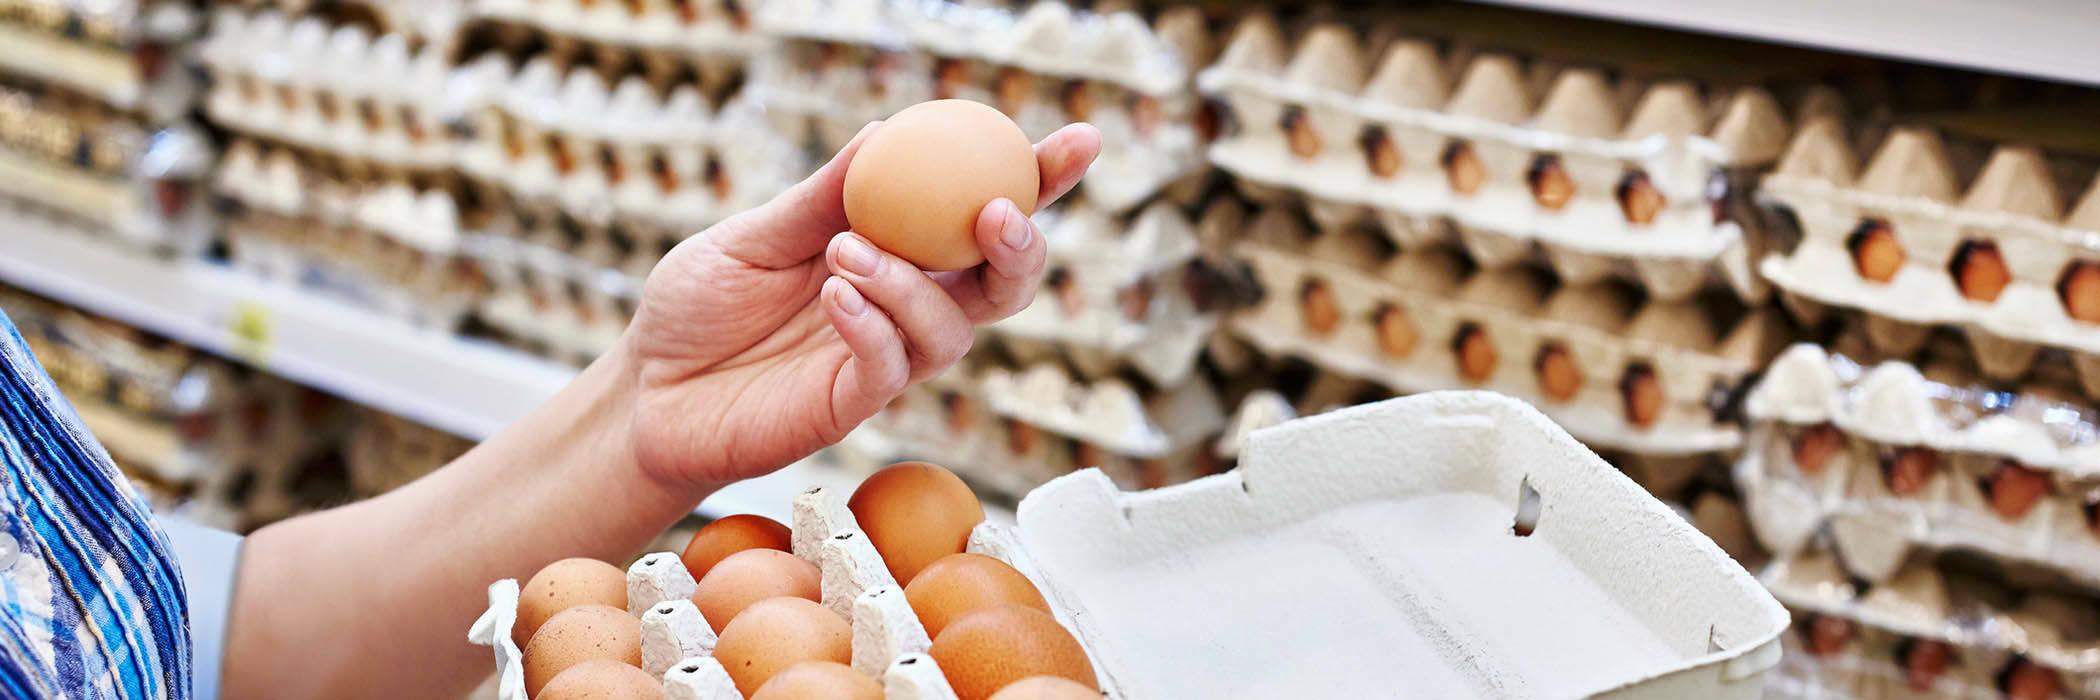 21sep eggs salmonella hero